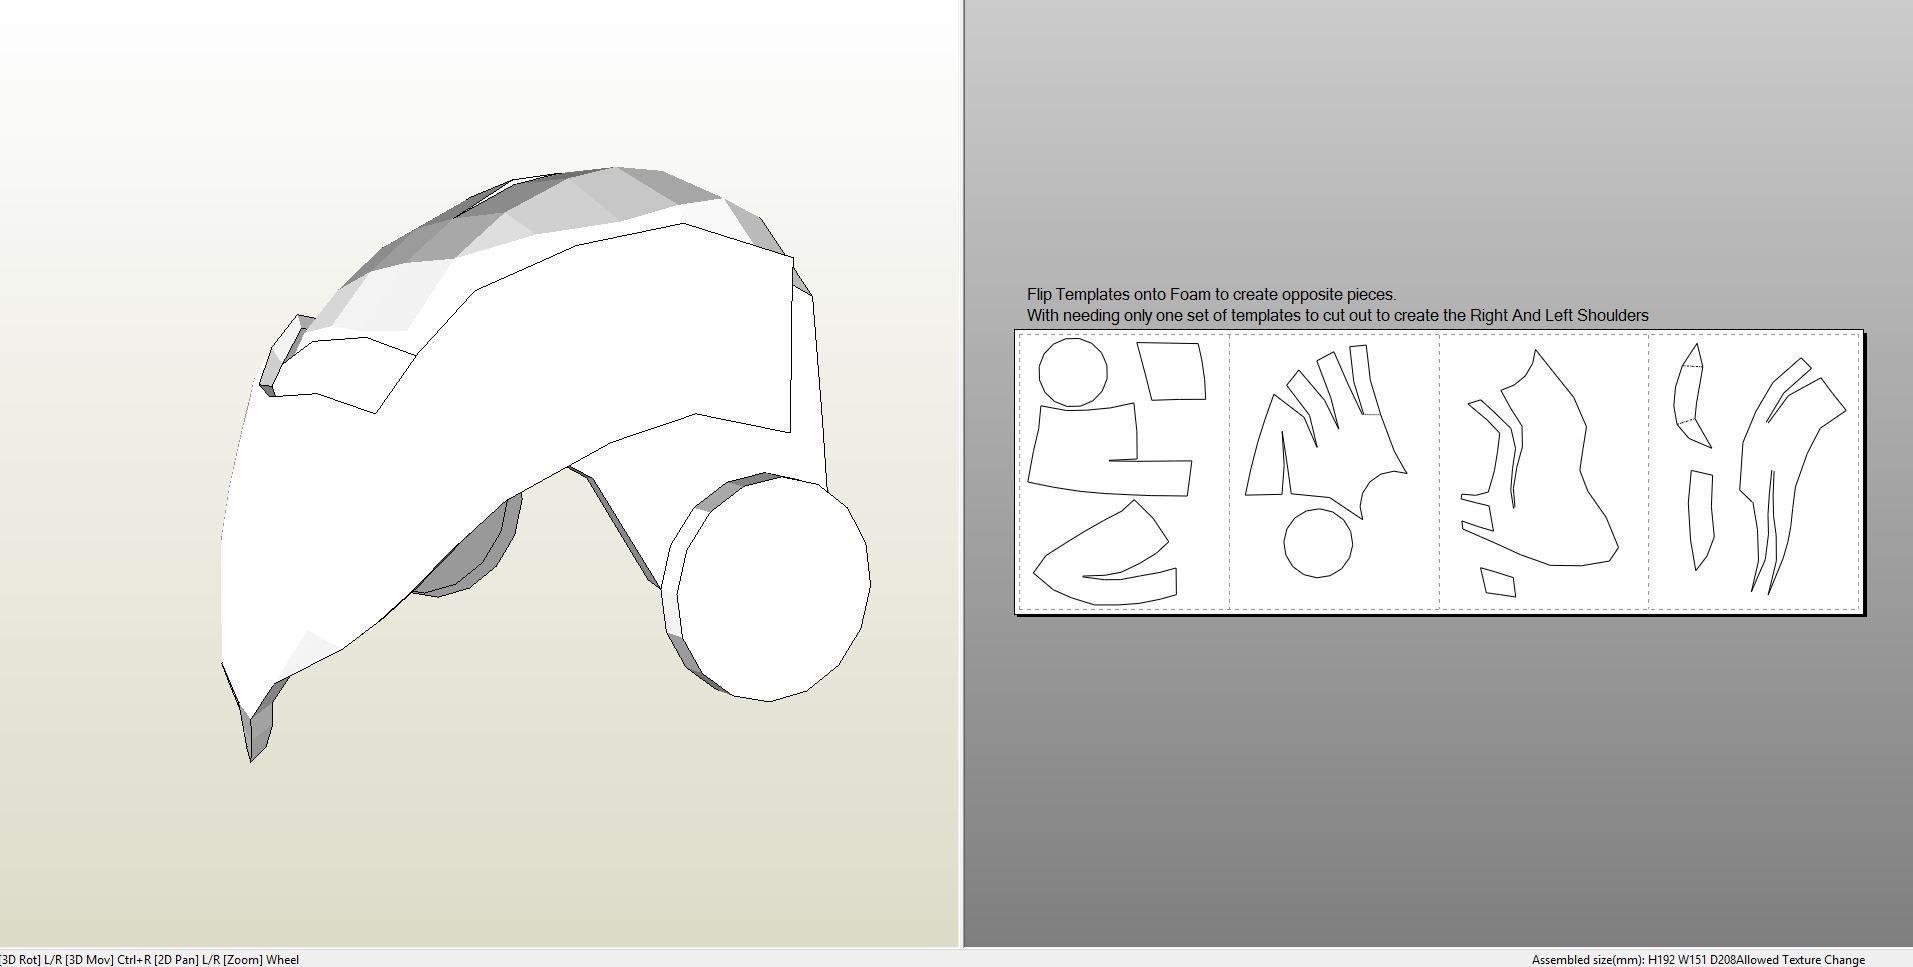 Ironman Papercraft Papercraft Pdo File Template for Iron Man Mark 4 & 6 Full Armor